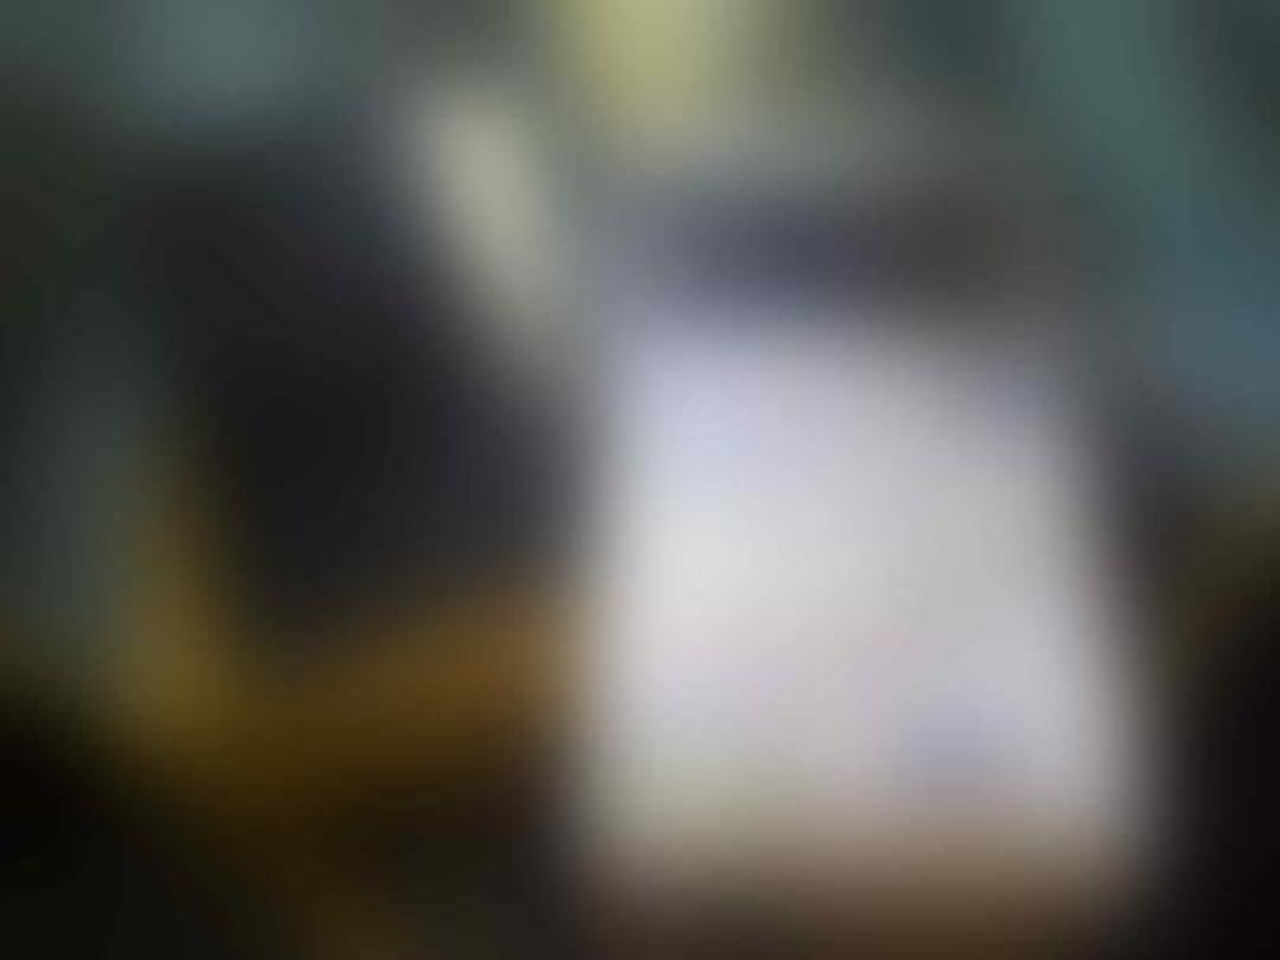 Lenovo A7000 Plus 2nd mulus rekber not (iphone, xiaomi, galaxy, asus)